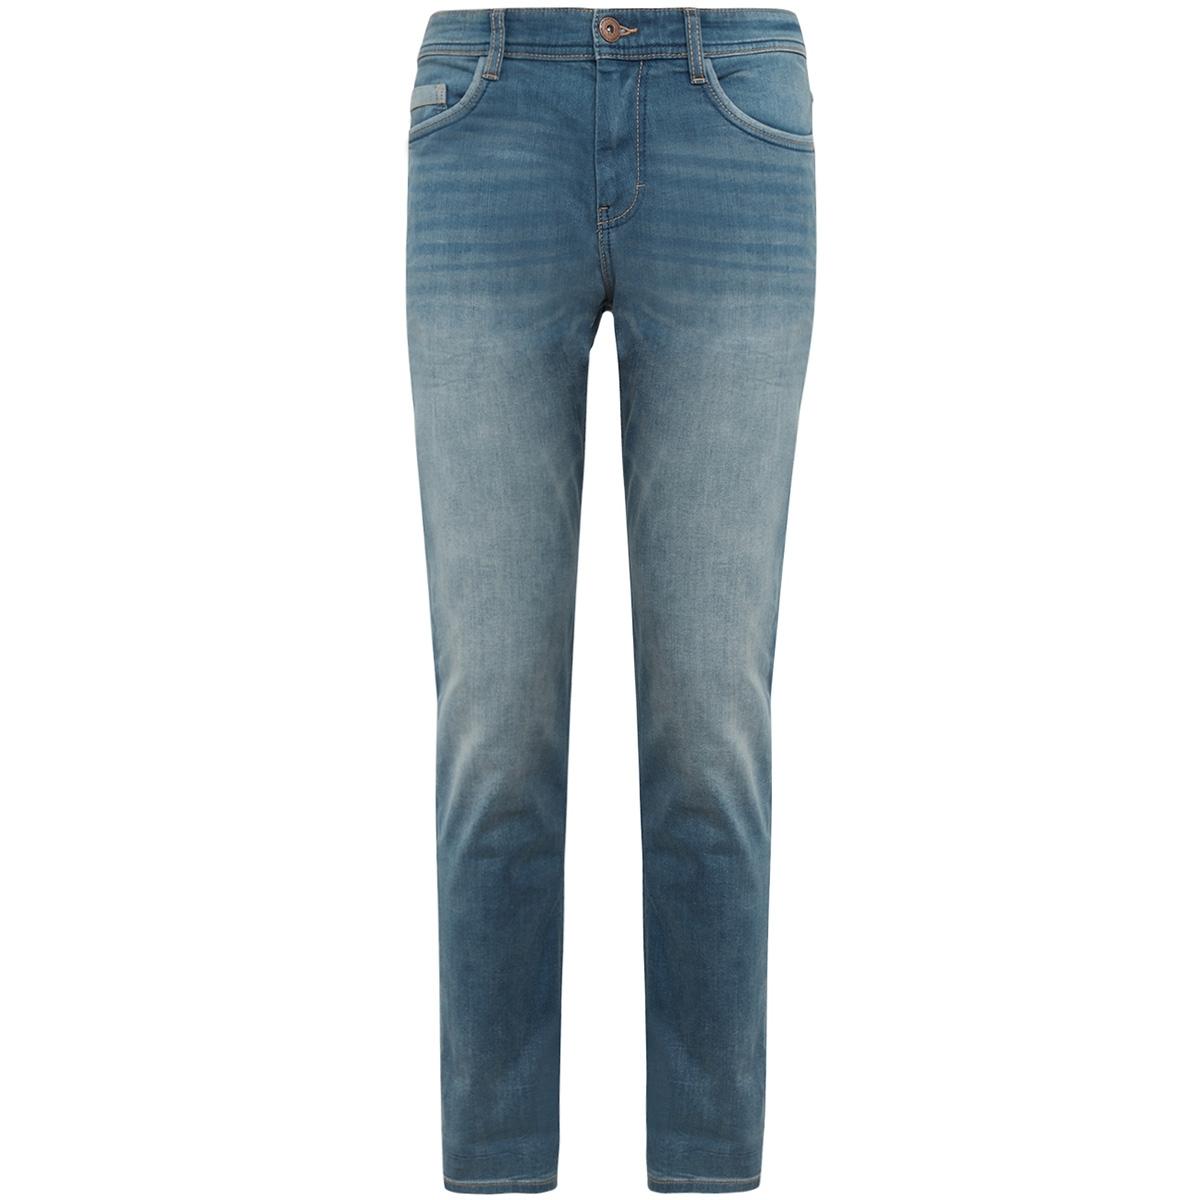 62554410910 tom tailor jeans 1051